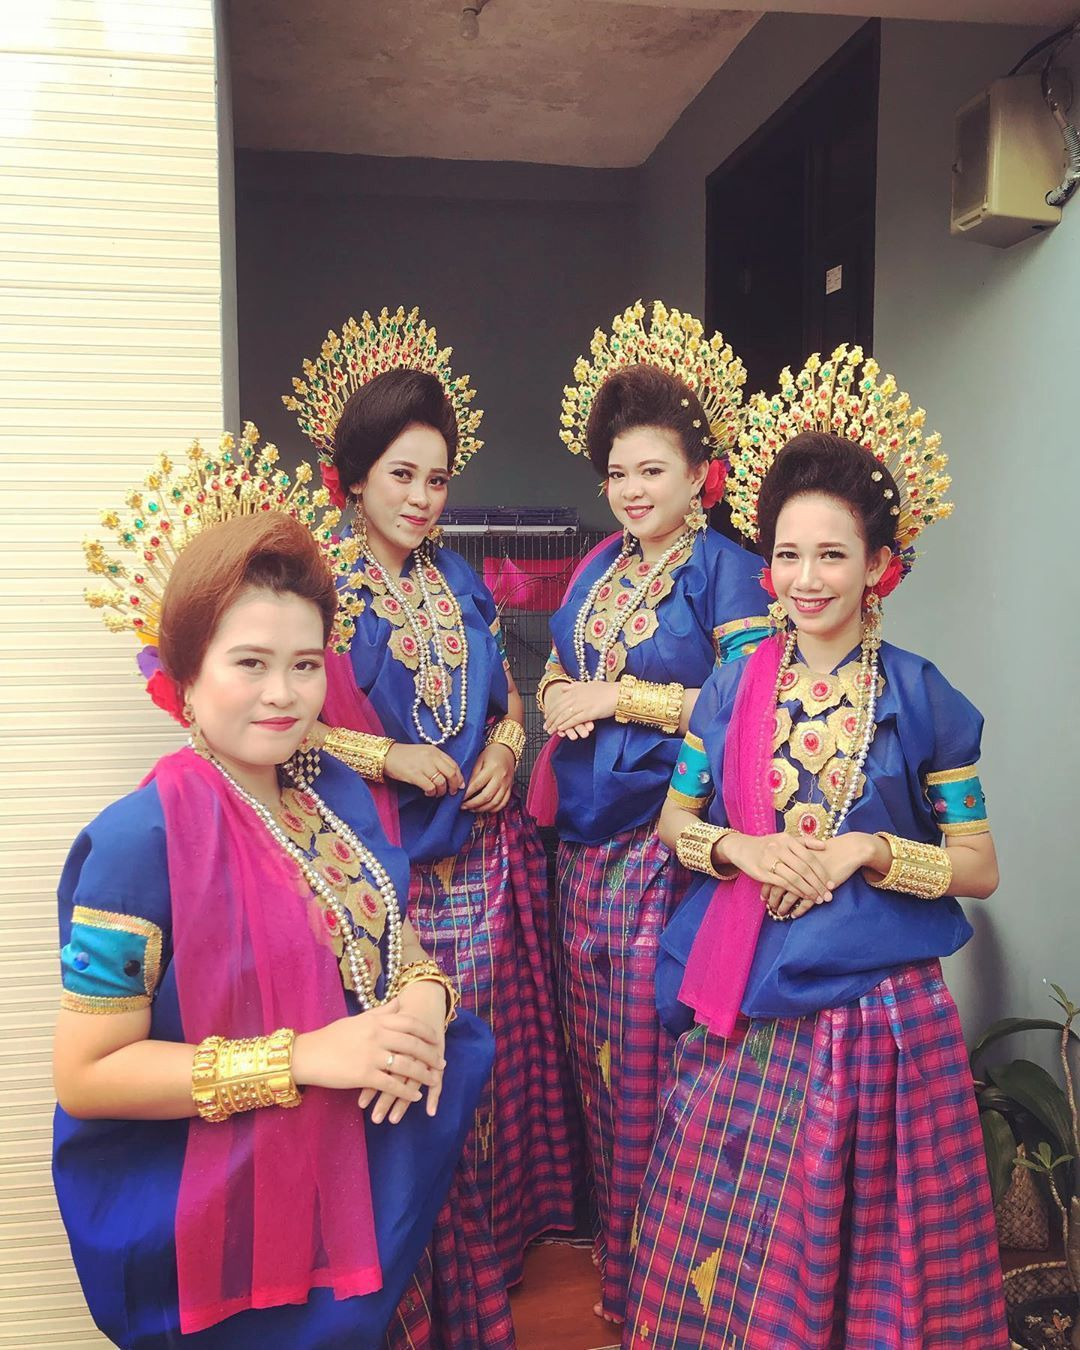 Pakaian Adat Surabaya Jawa Timur